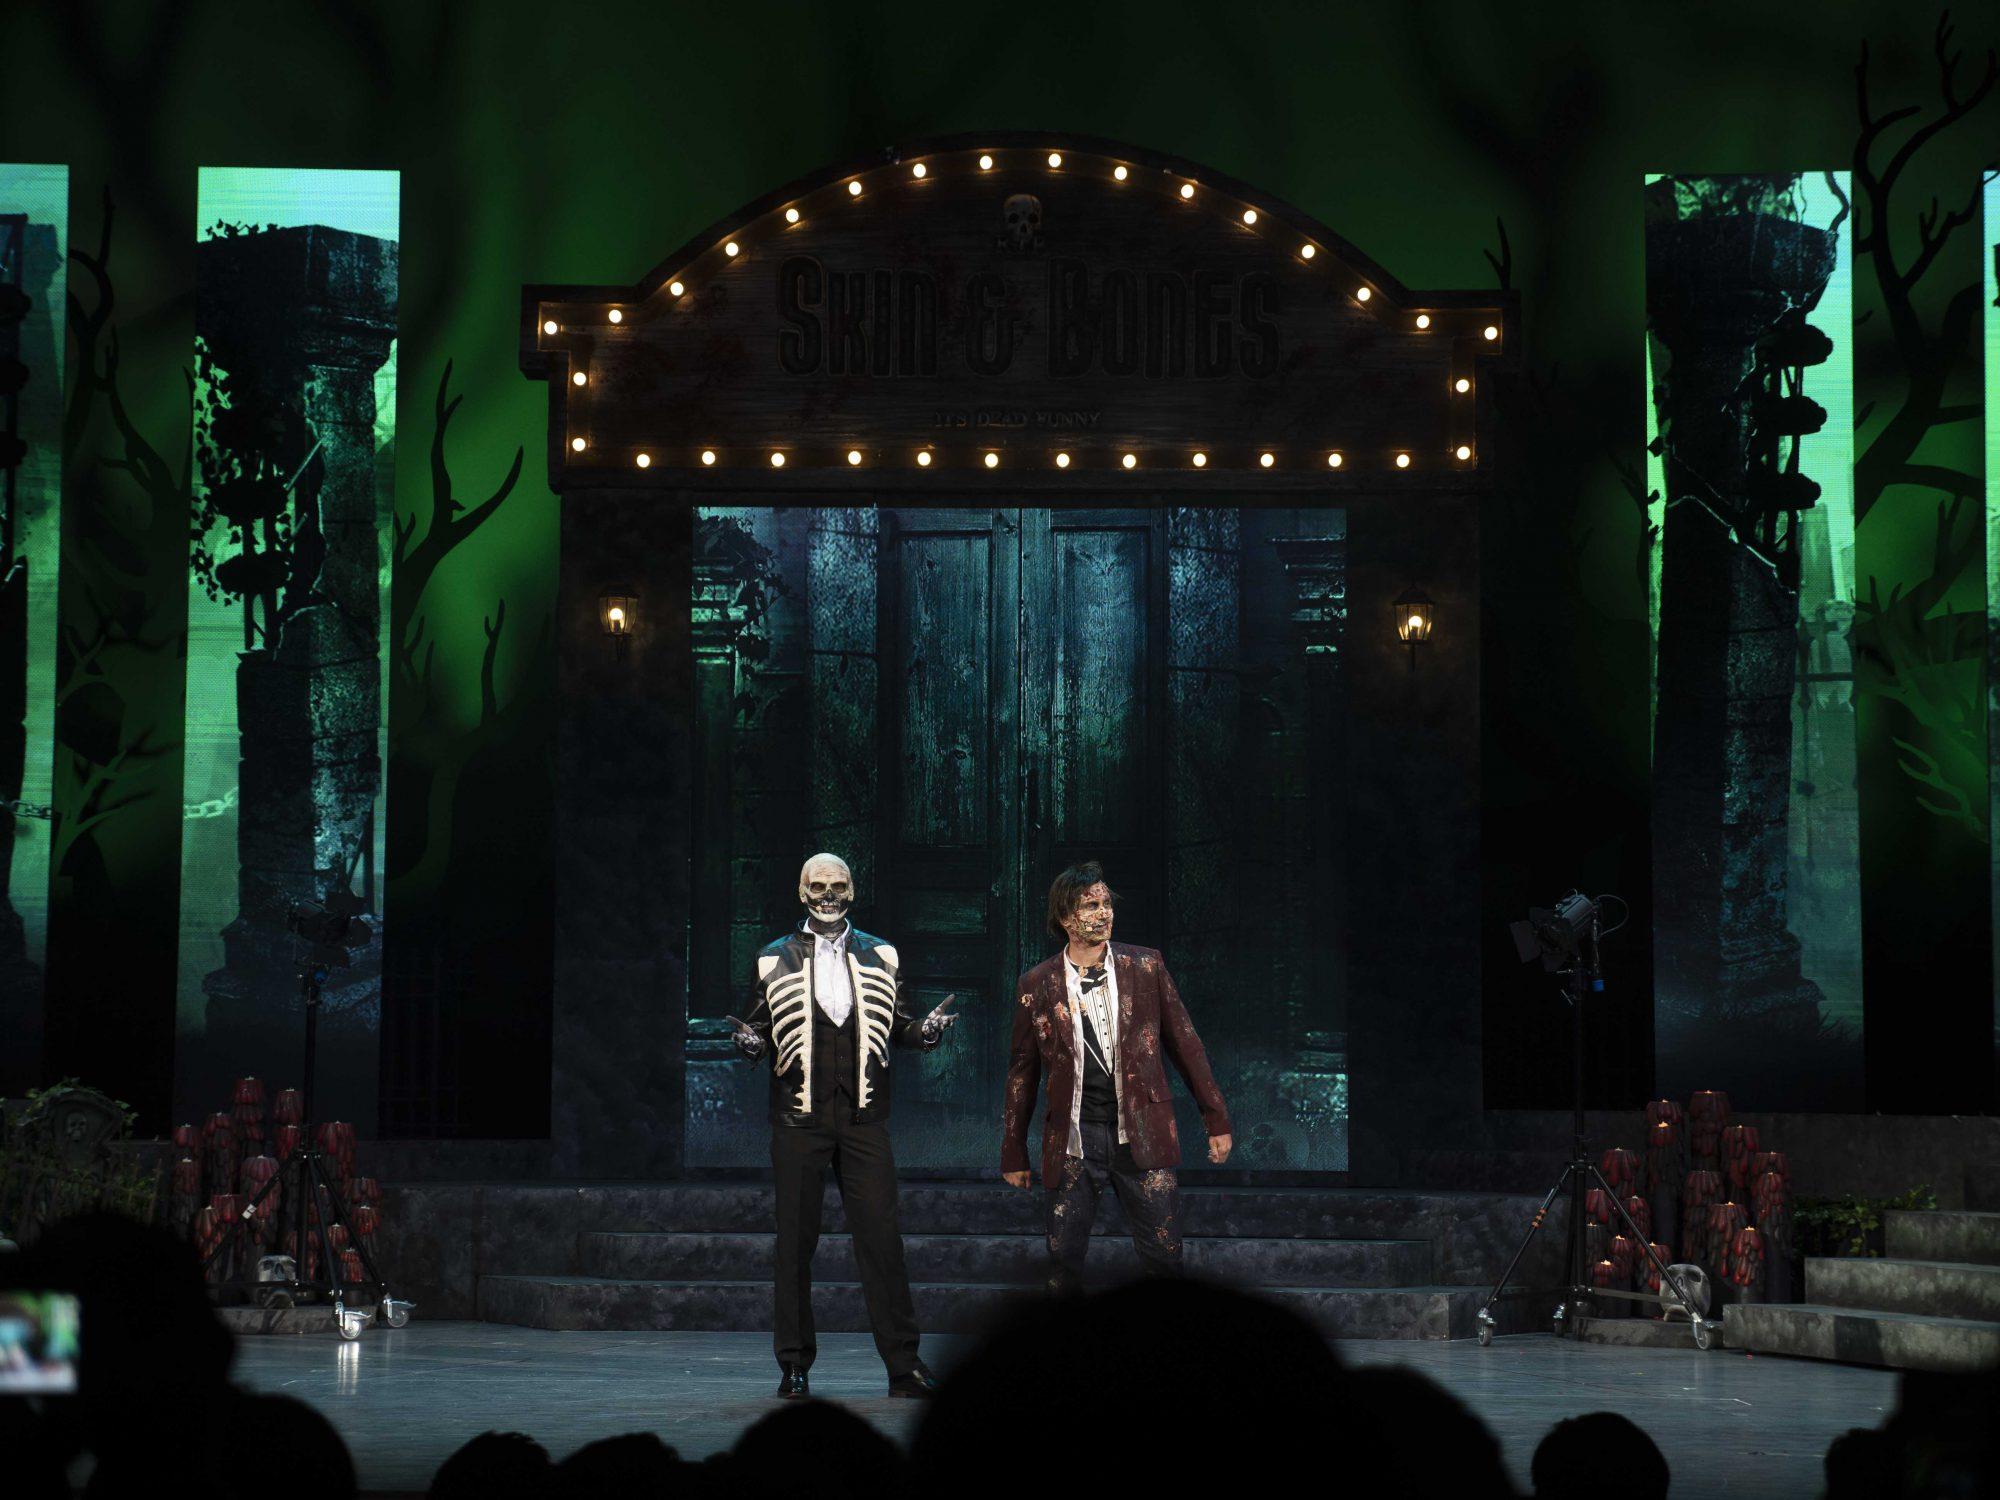 Universal Studios Singapore's Halloween Horror Nights 9